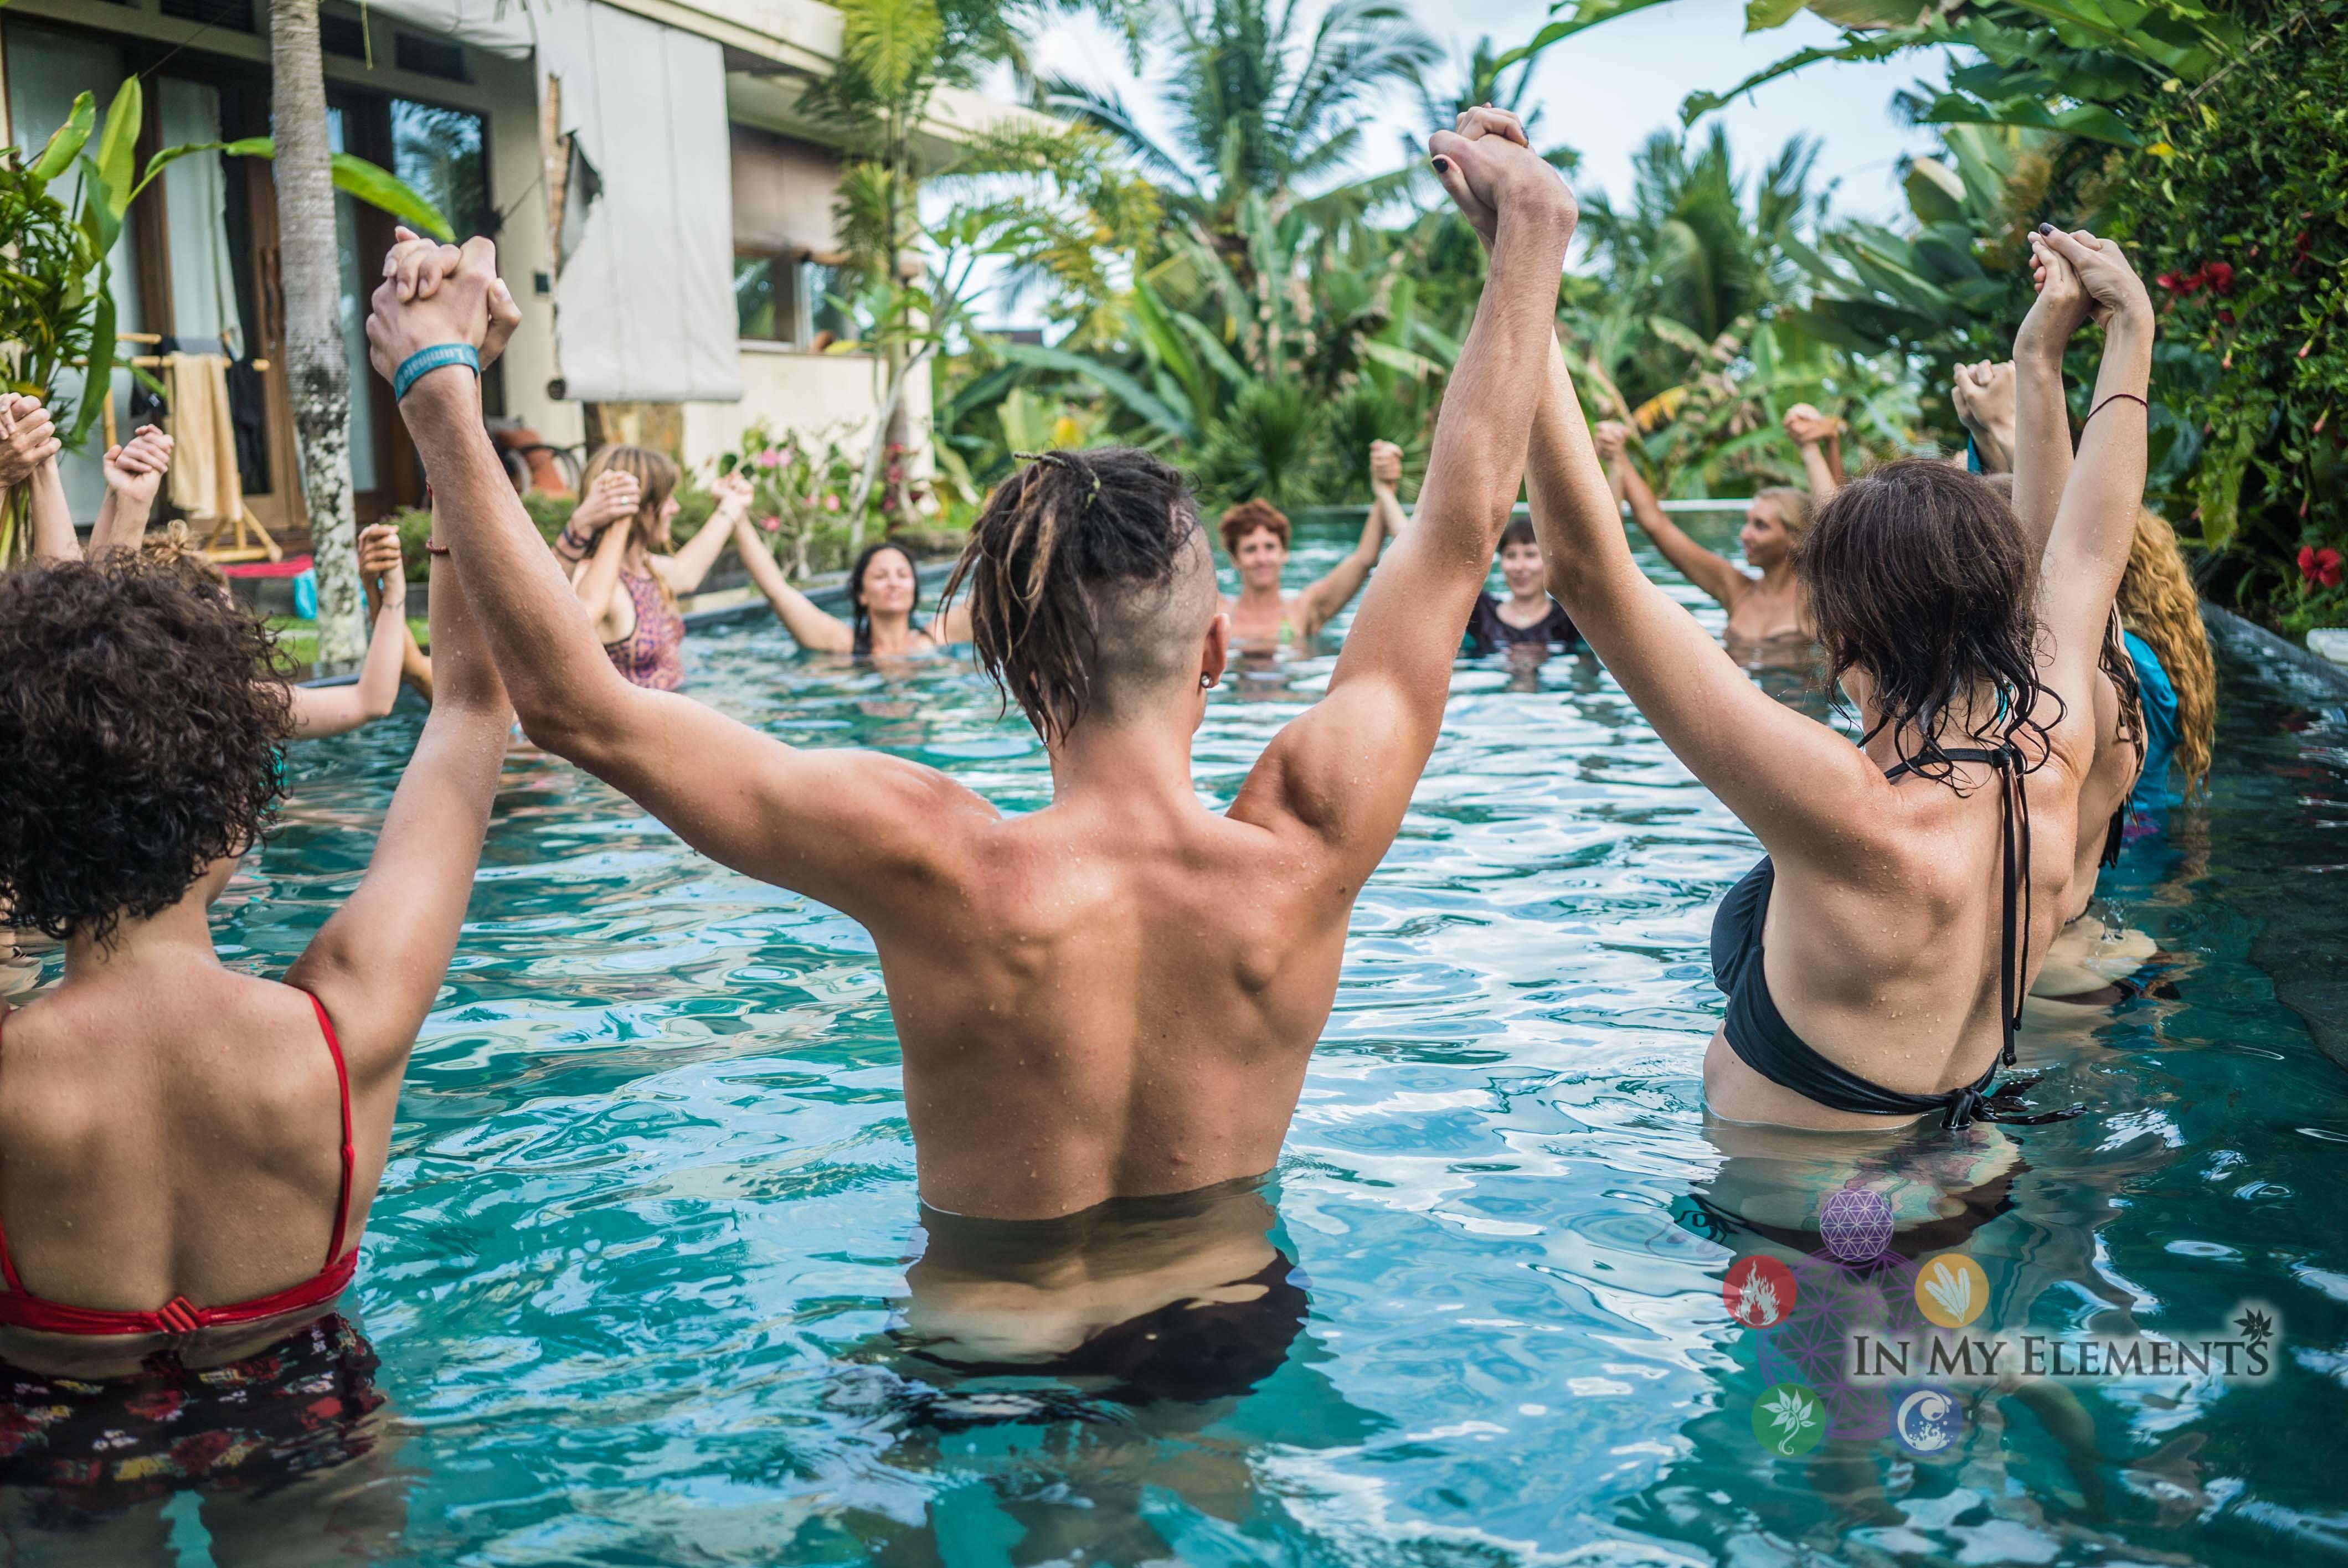 Ecstatic dancing In the pool